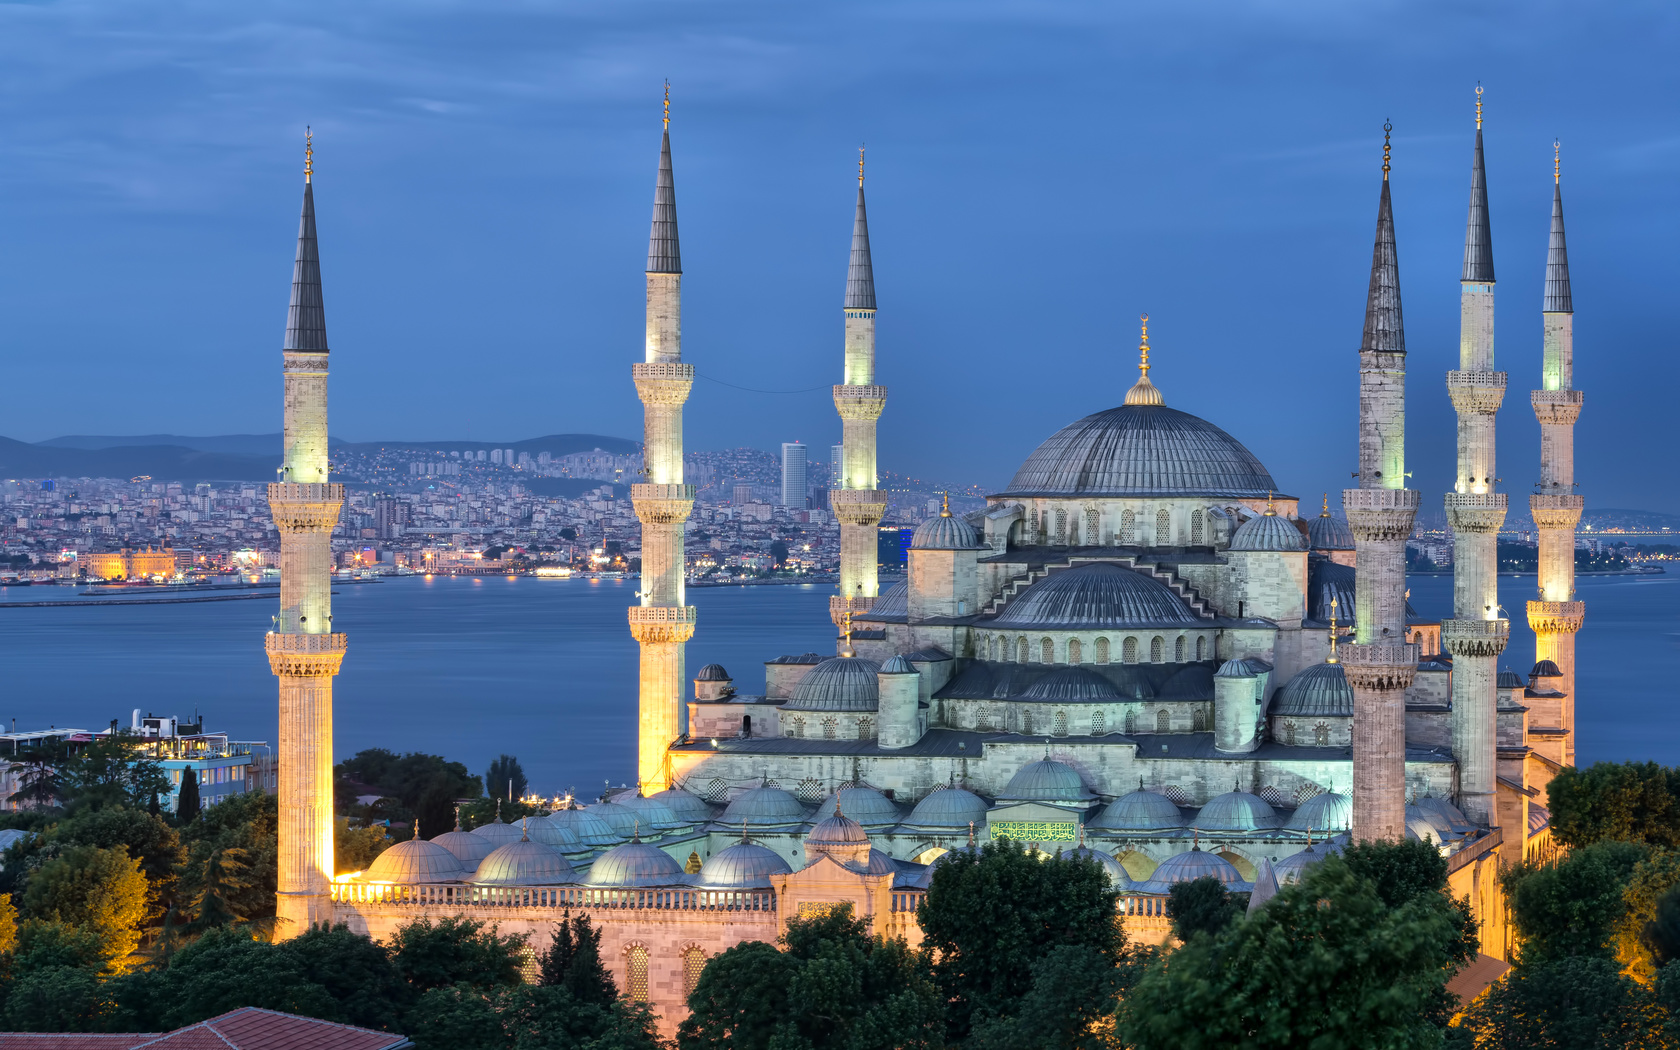 турция, мечеть султанахмет, город, вечер, istanbul, стамбул, turkey, красиво, mosque